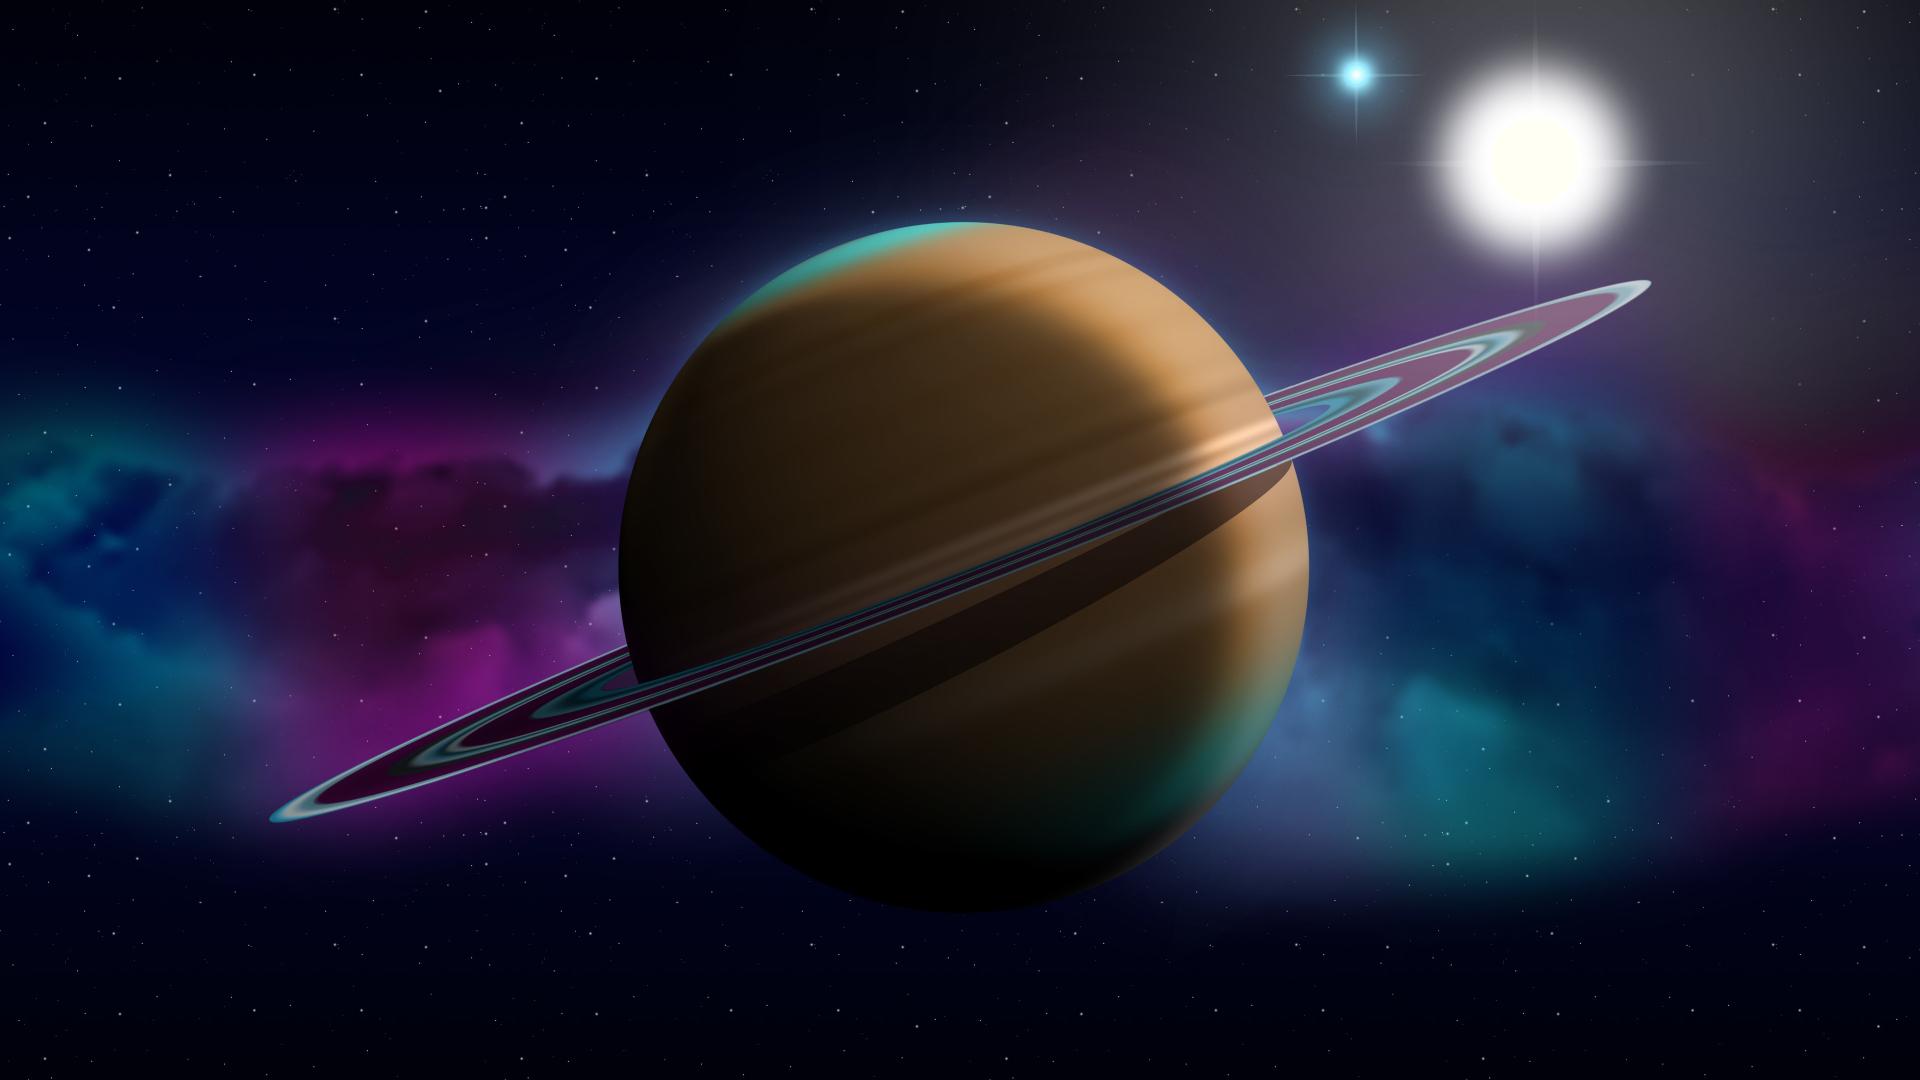 Download 1920x1080 Wallpaper Saturn Planet Space Digital